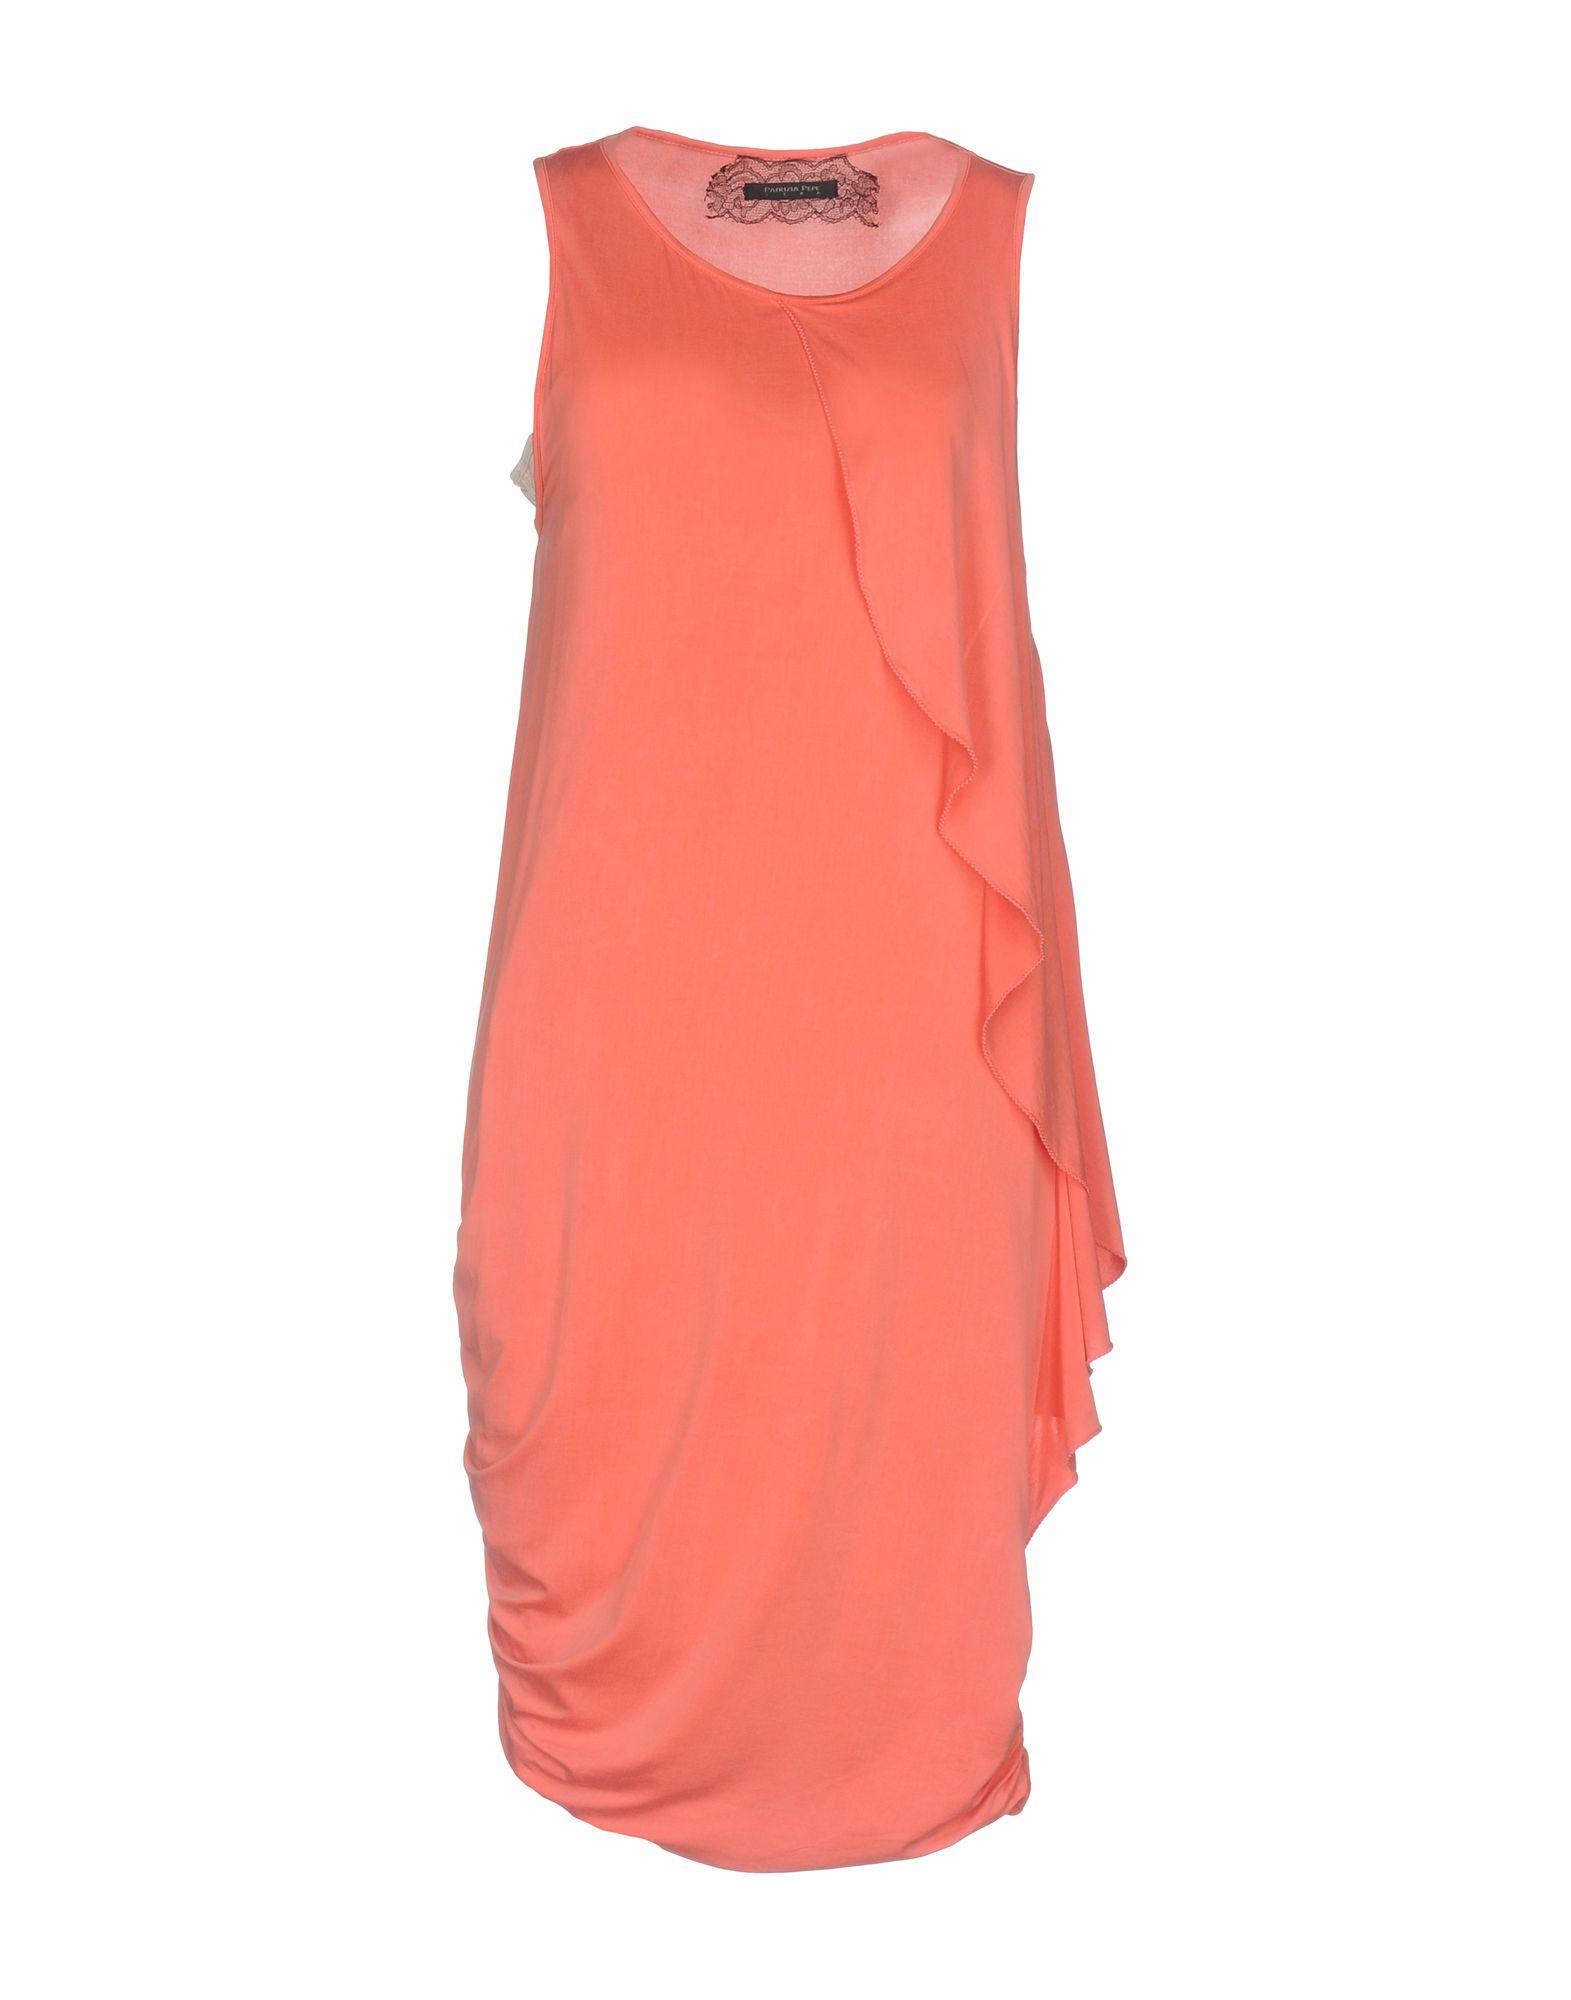 PATRIZIA PEPE SERA Короткое платье patrizia pepe короткое платье из хлопкового поплина стрейч